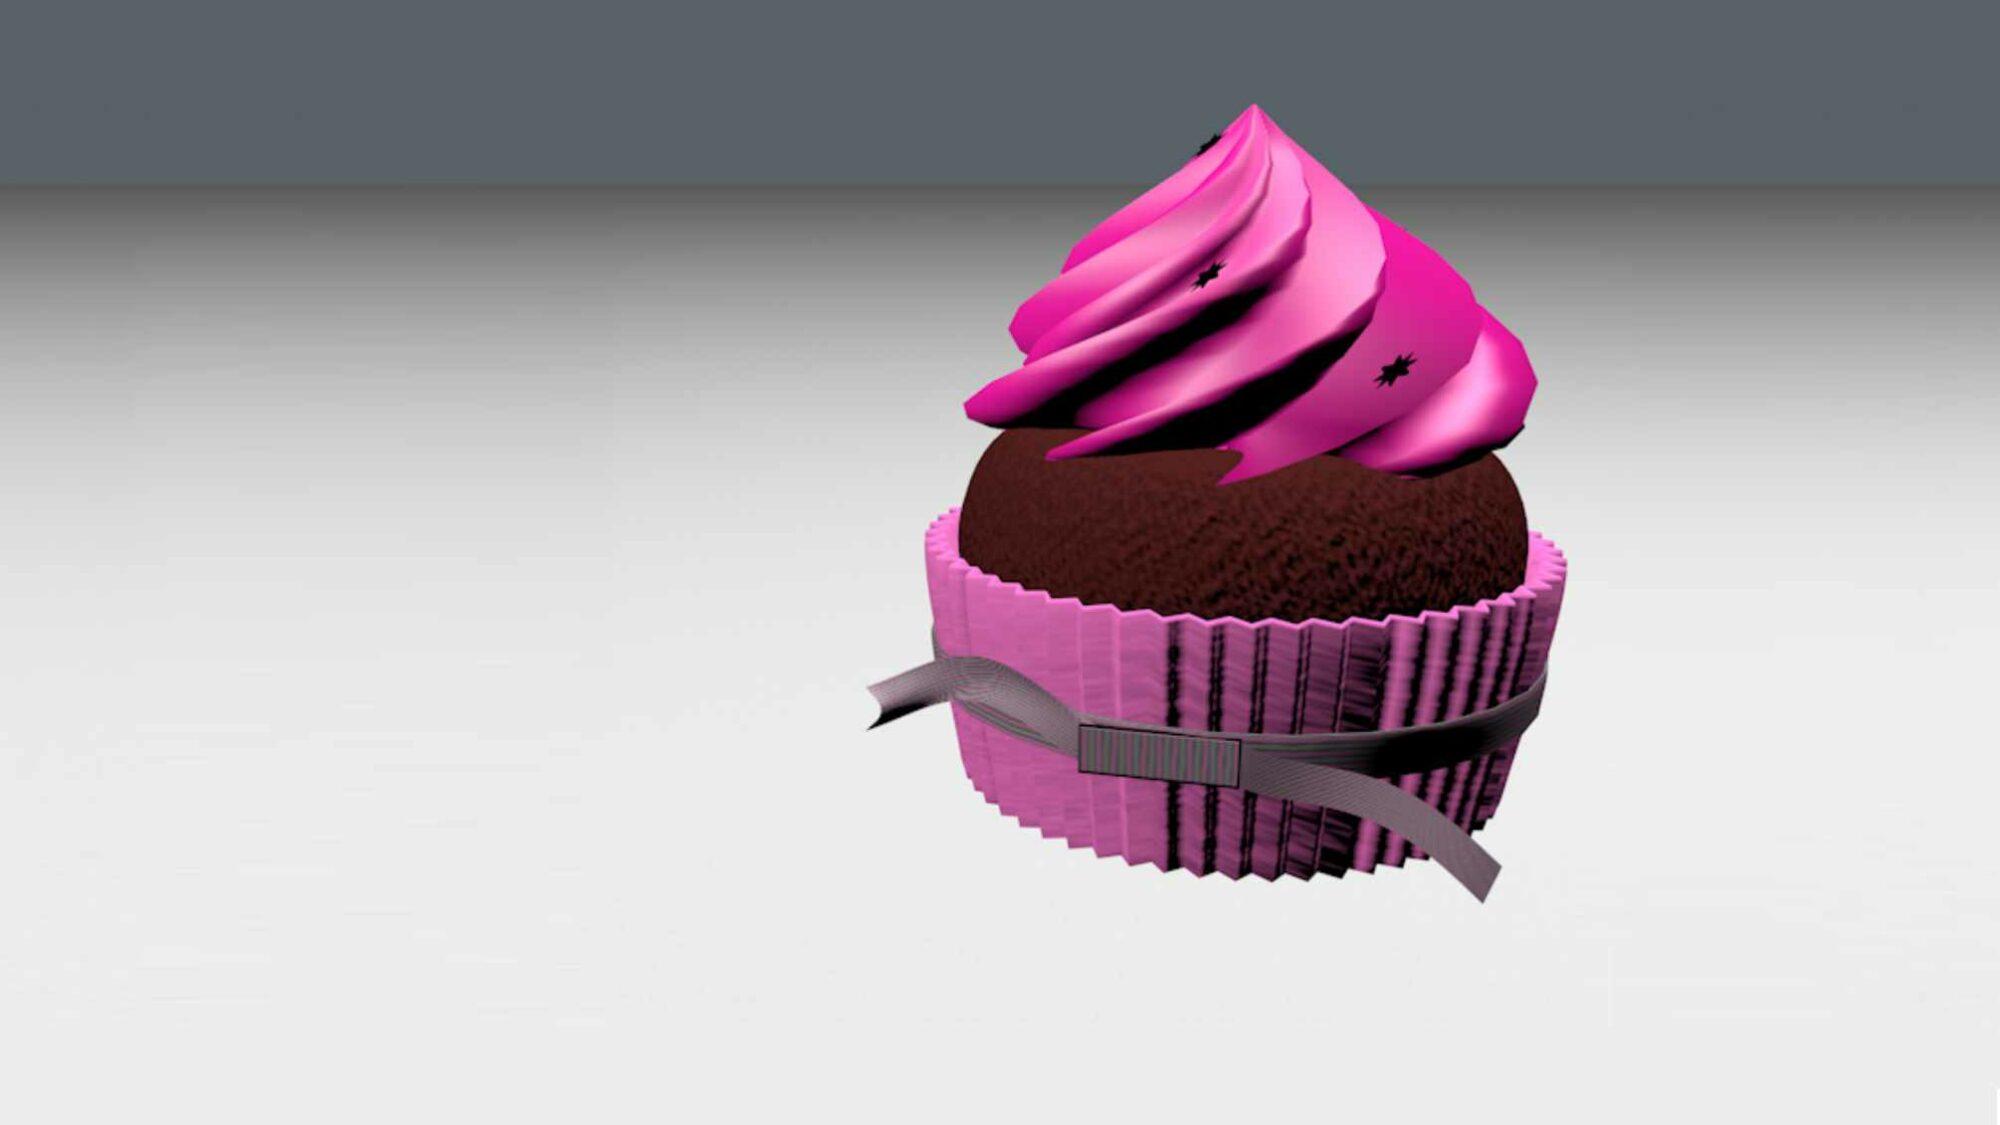 cupcake 3d cinema 4d